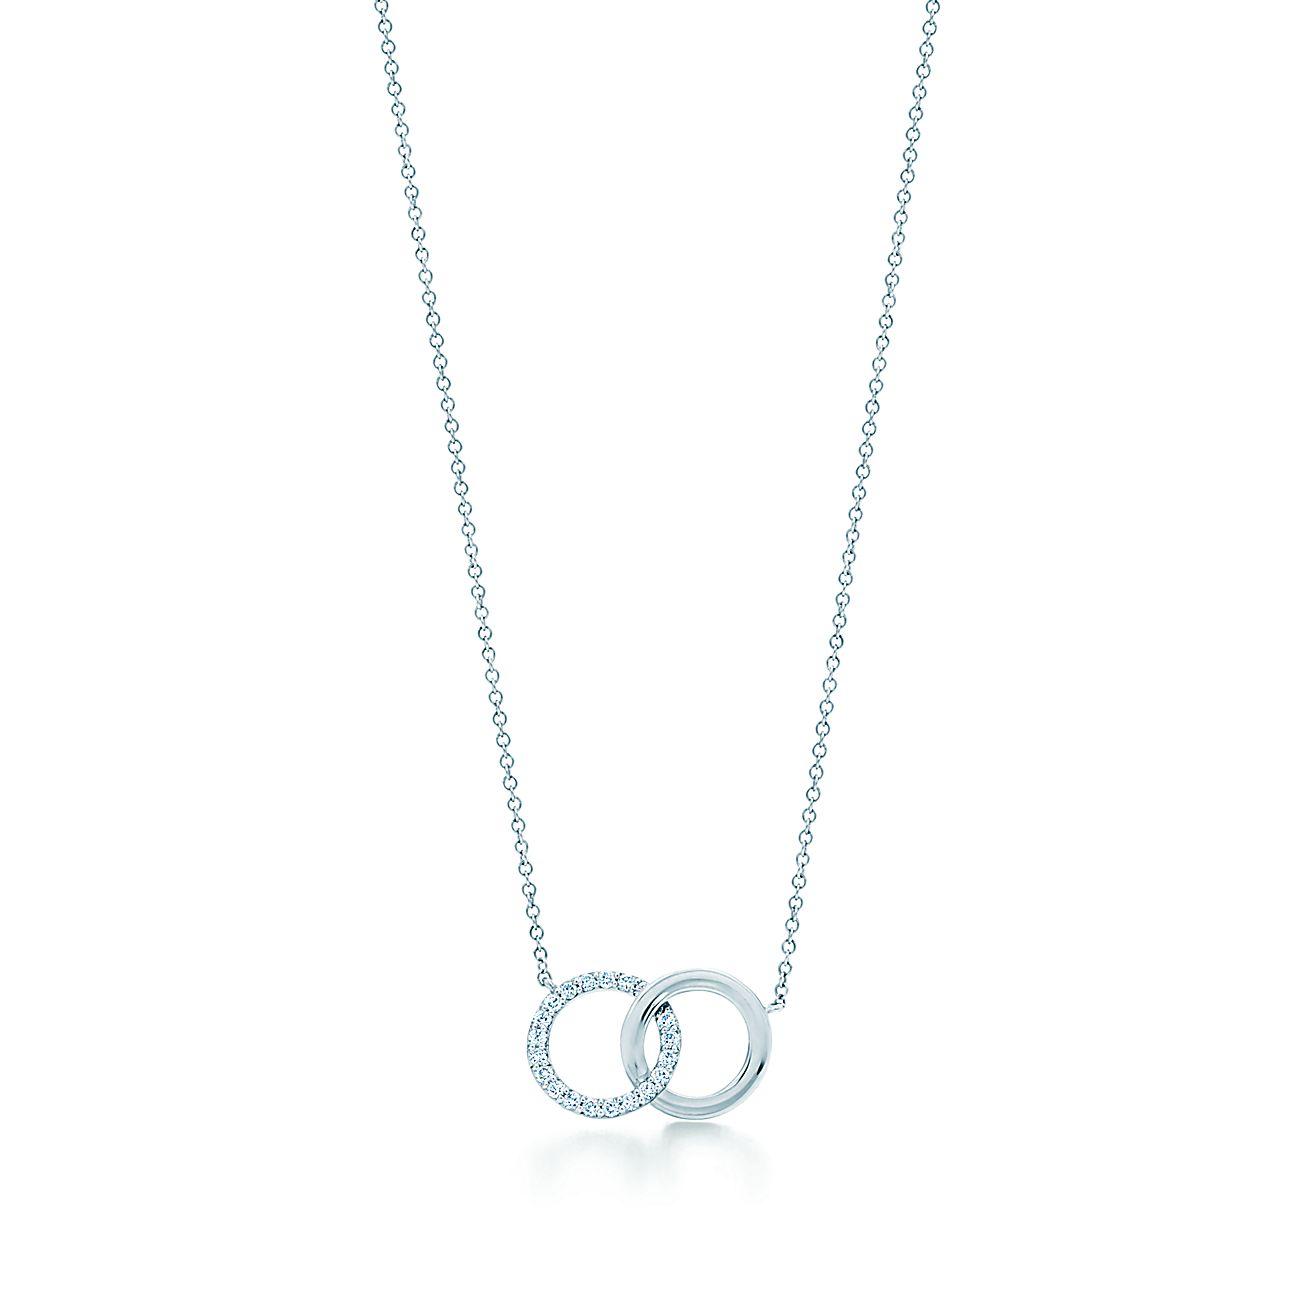 Tiffany 1837®:Double Interlocking<br>Circles Pendant